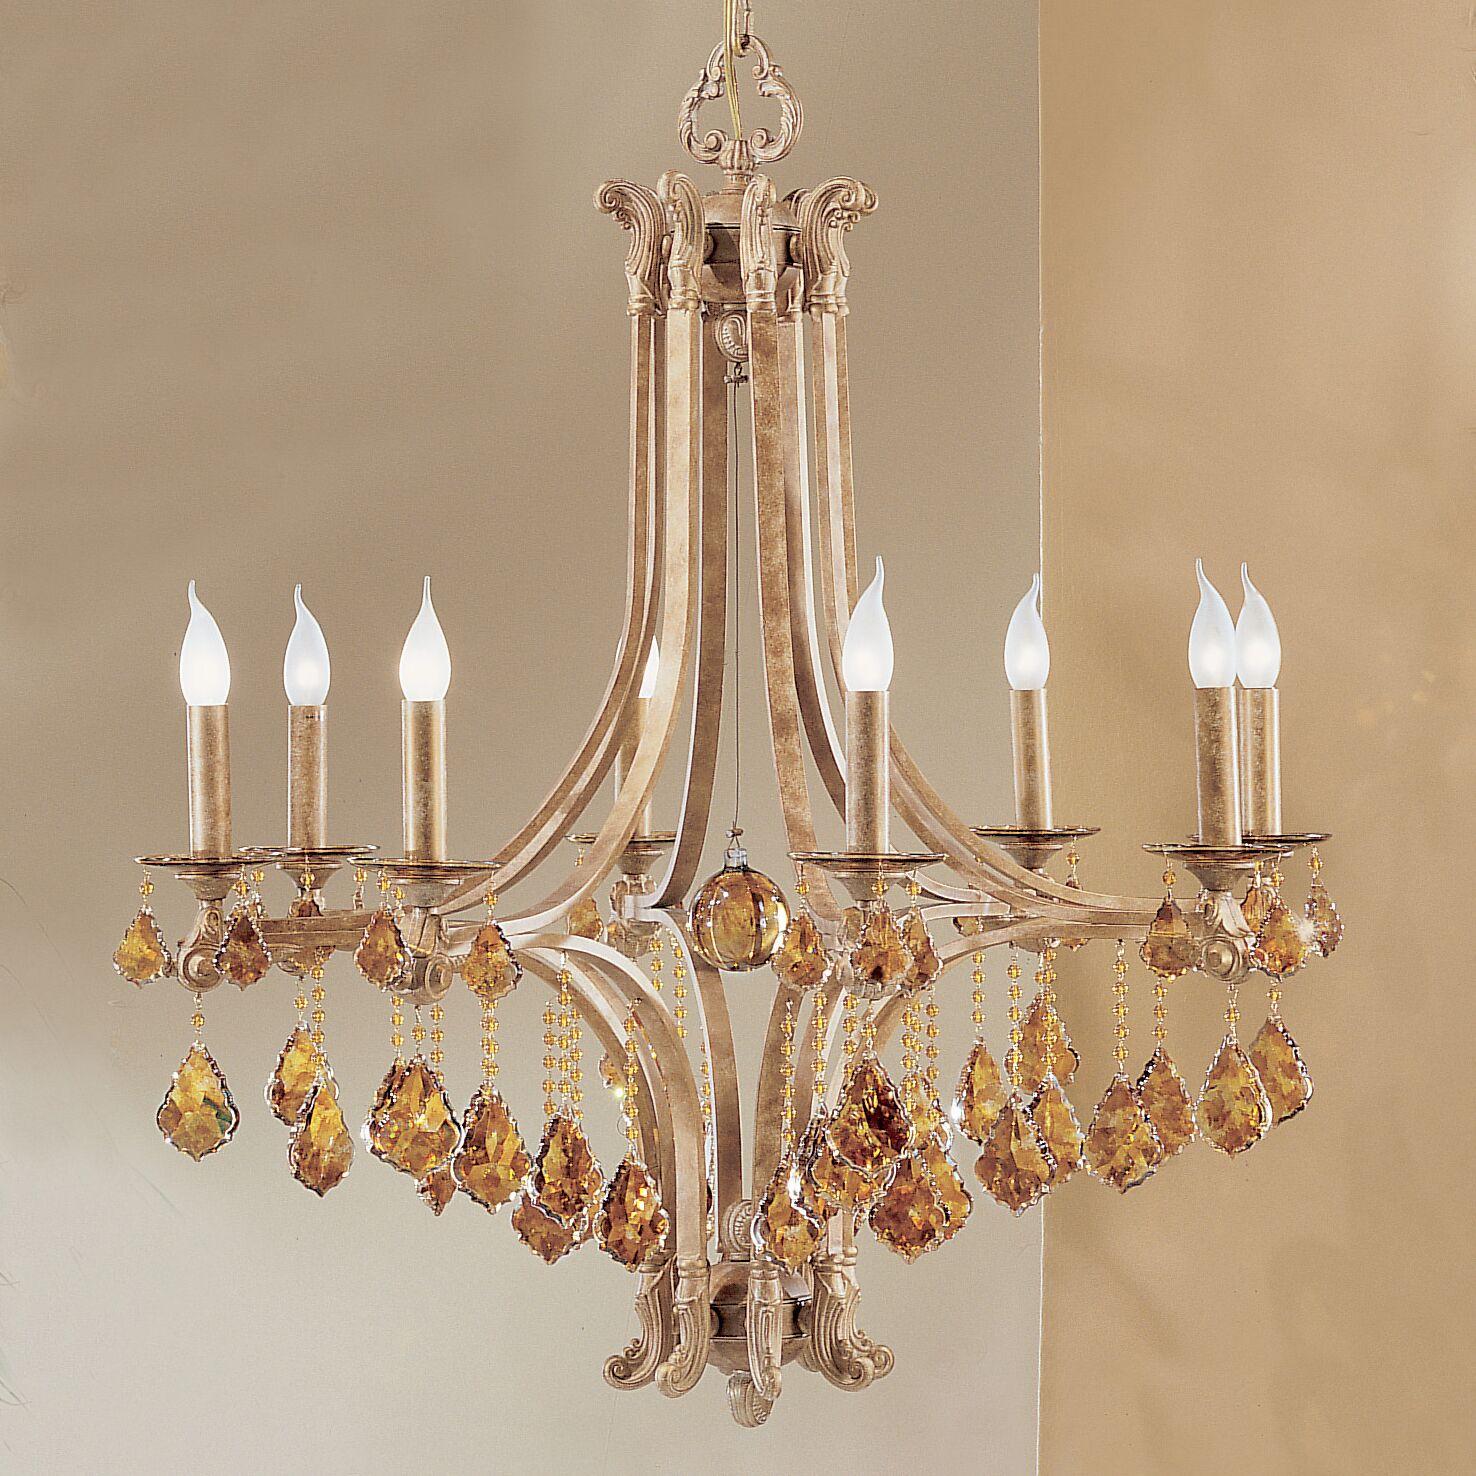 Mediterranean 8-Light Candle Style Chandelier